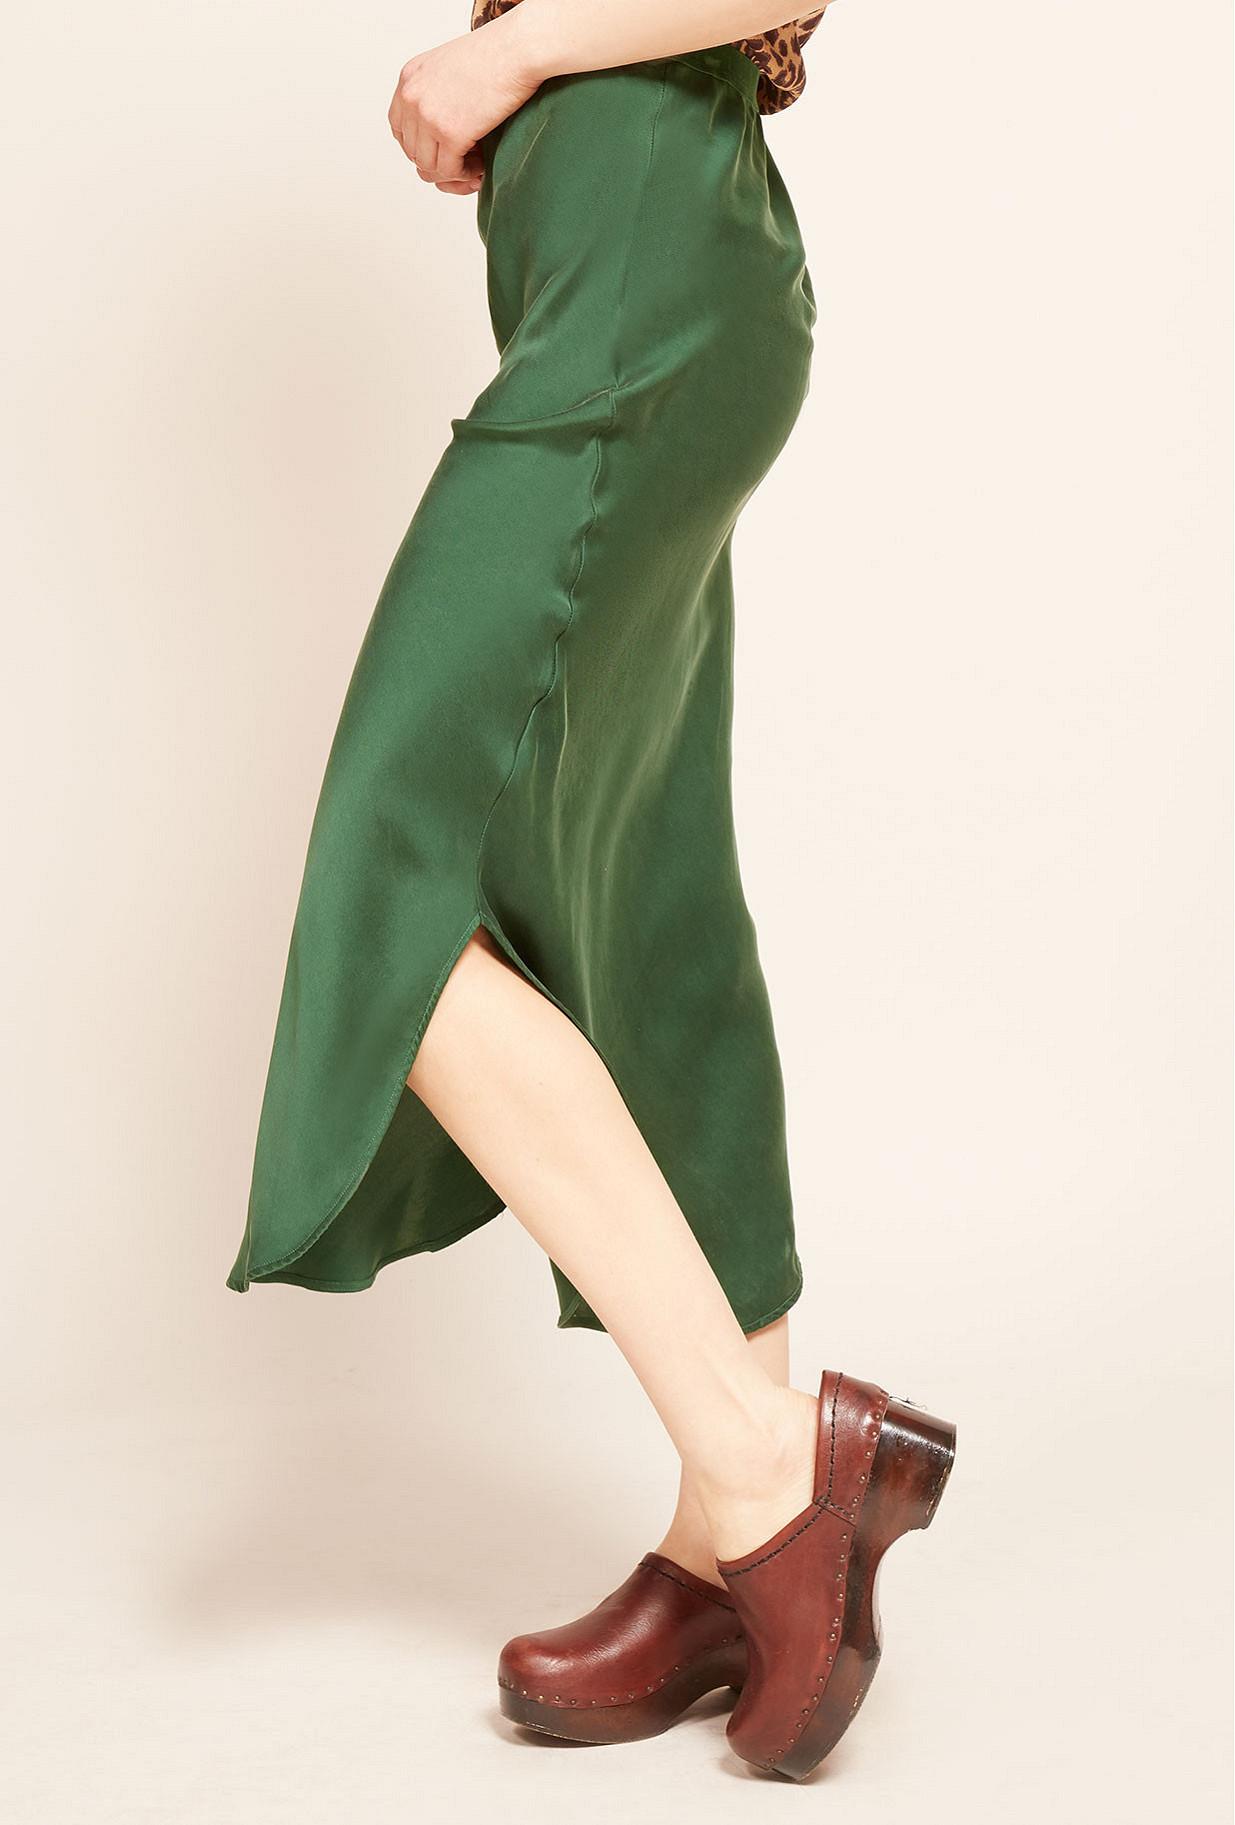 Paris clothes store Skirt  Alice french designer fashion Paris